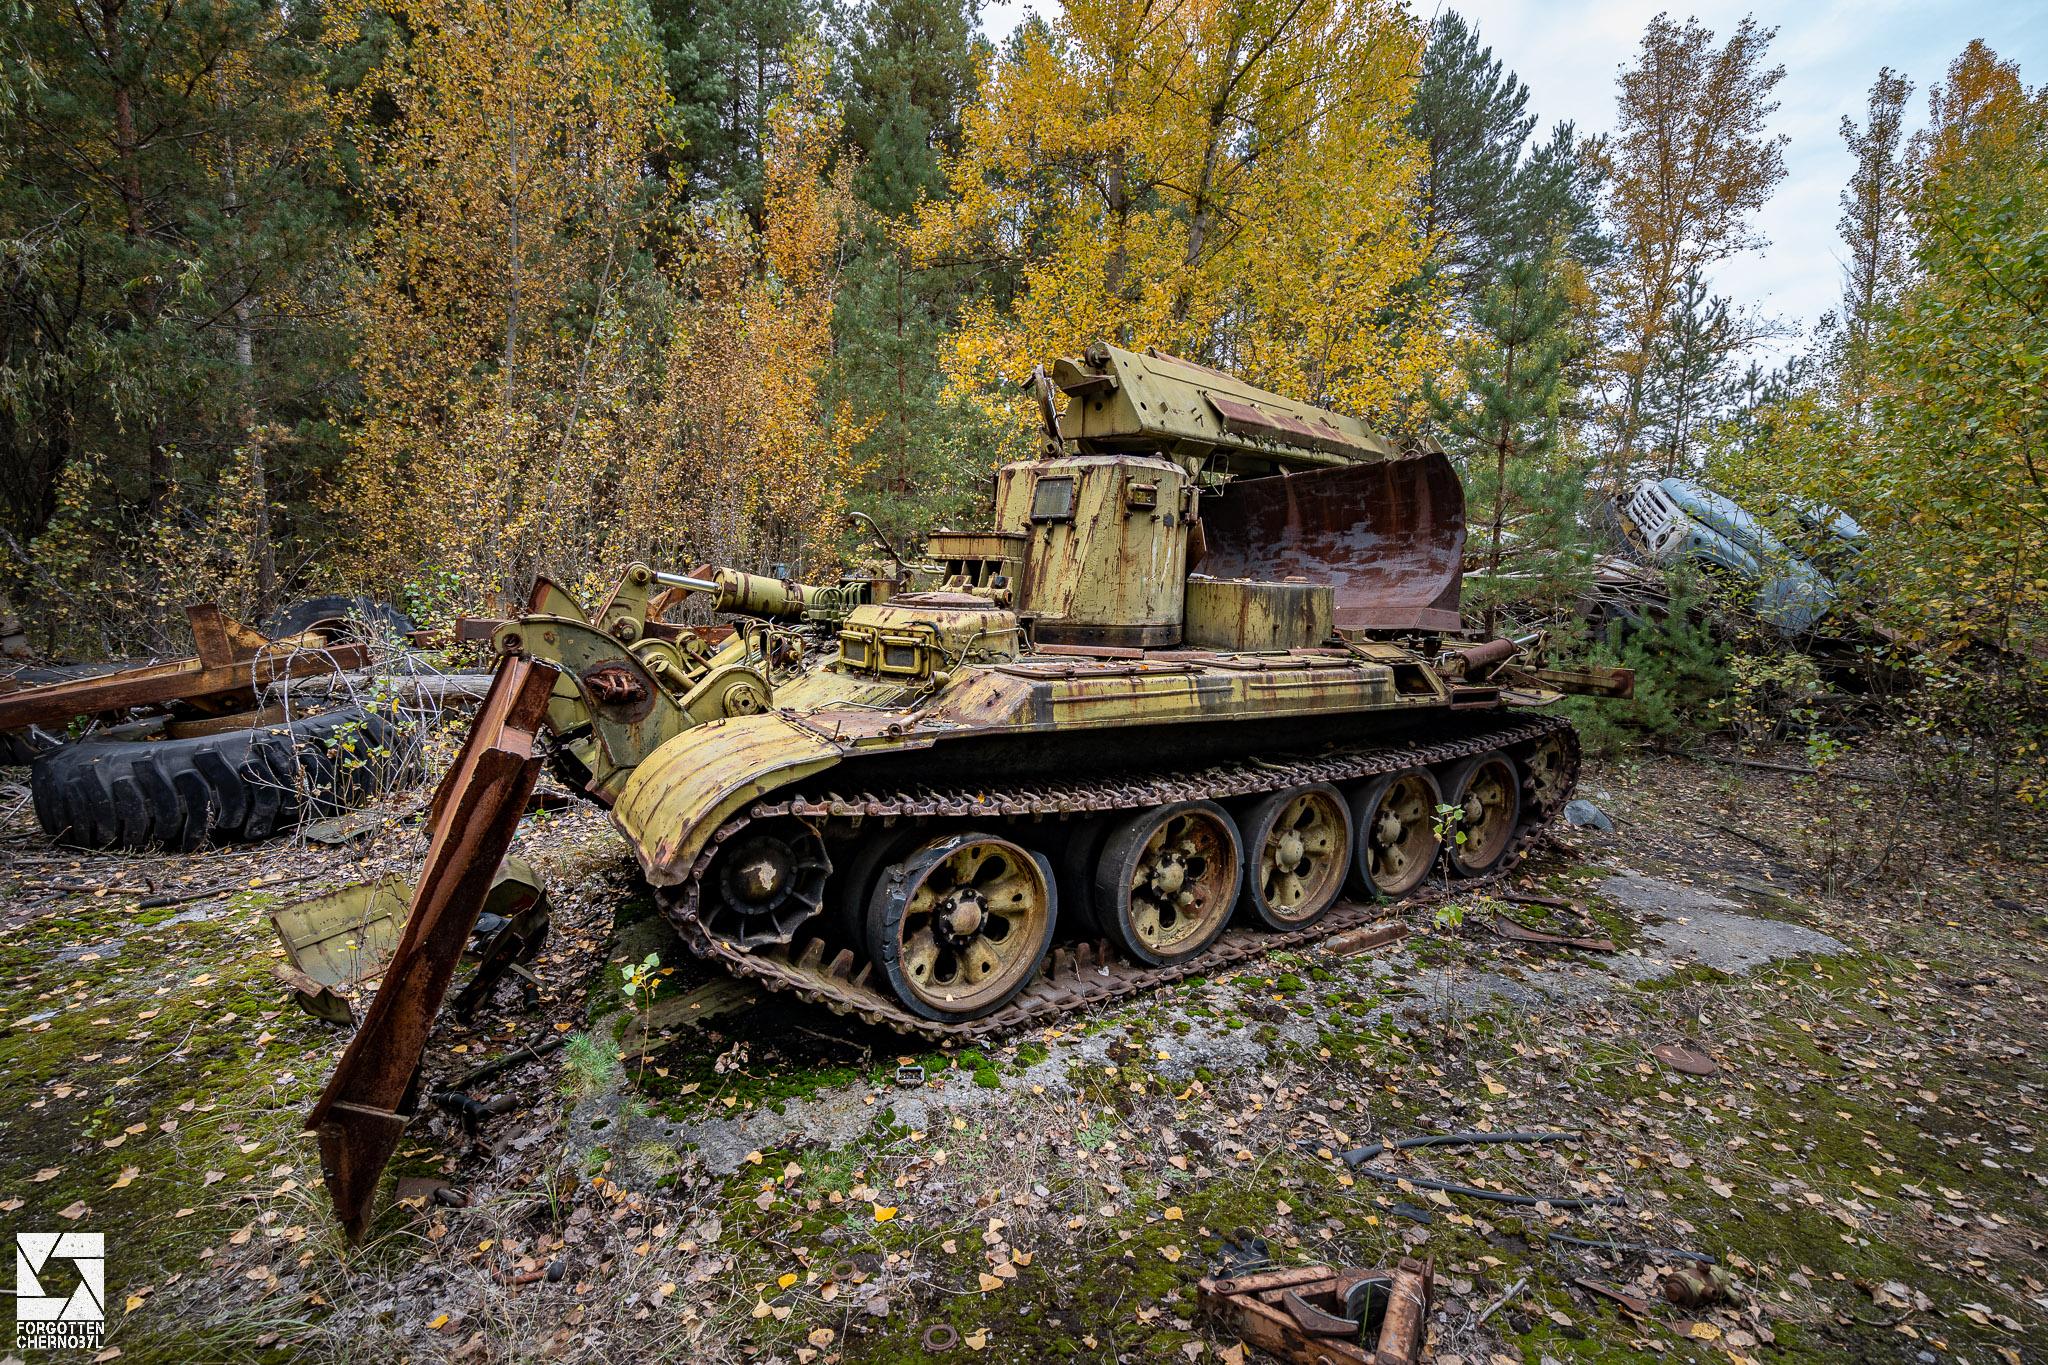 IMR Engineering Vehicle at the ATH 2 garage and repair facility near Pripyat